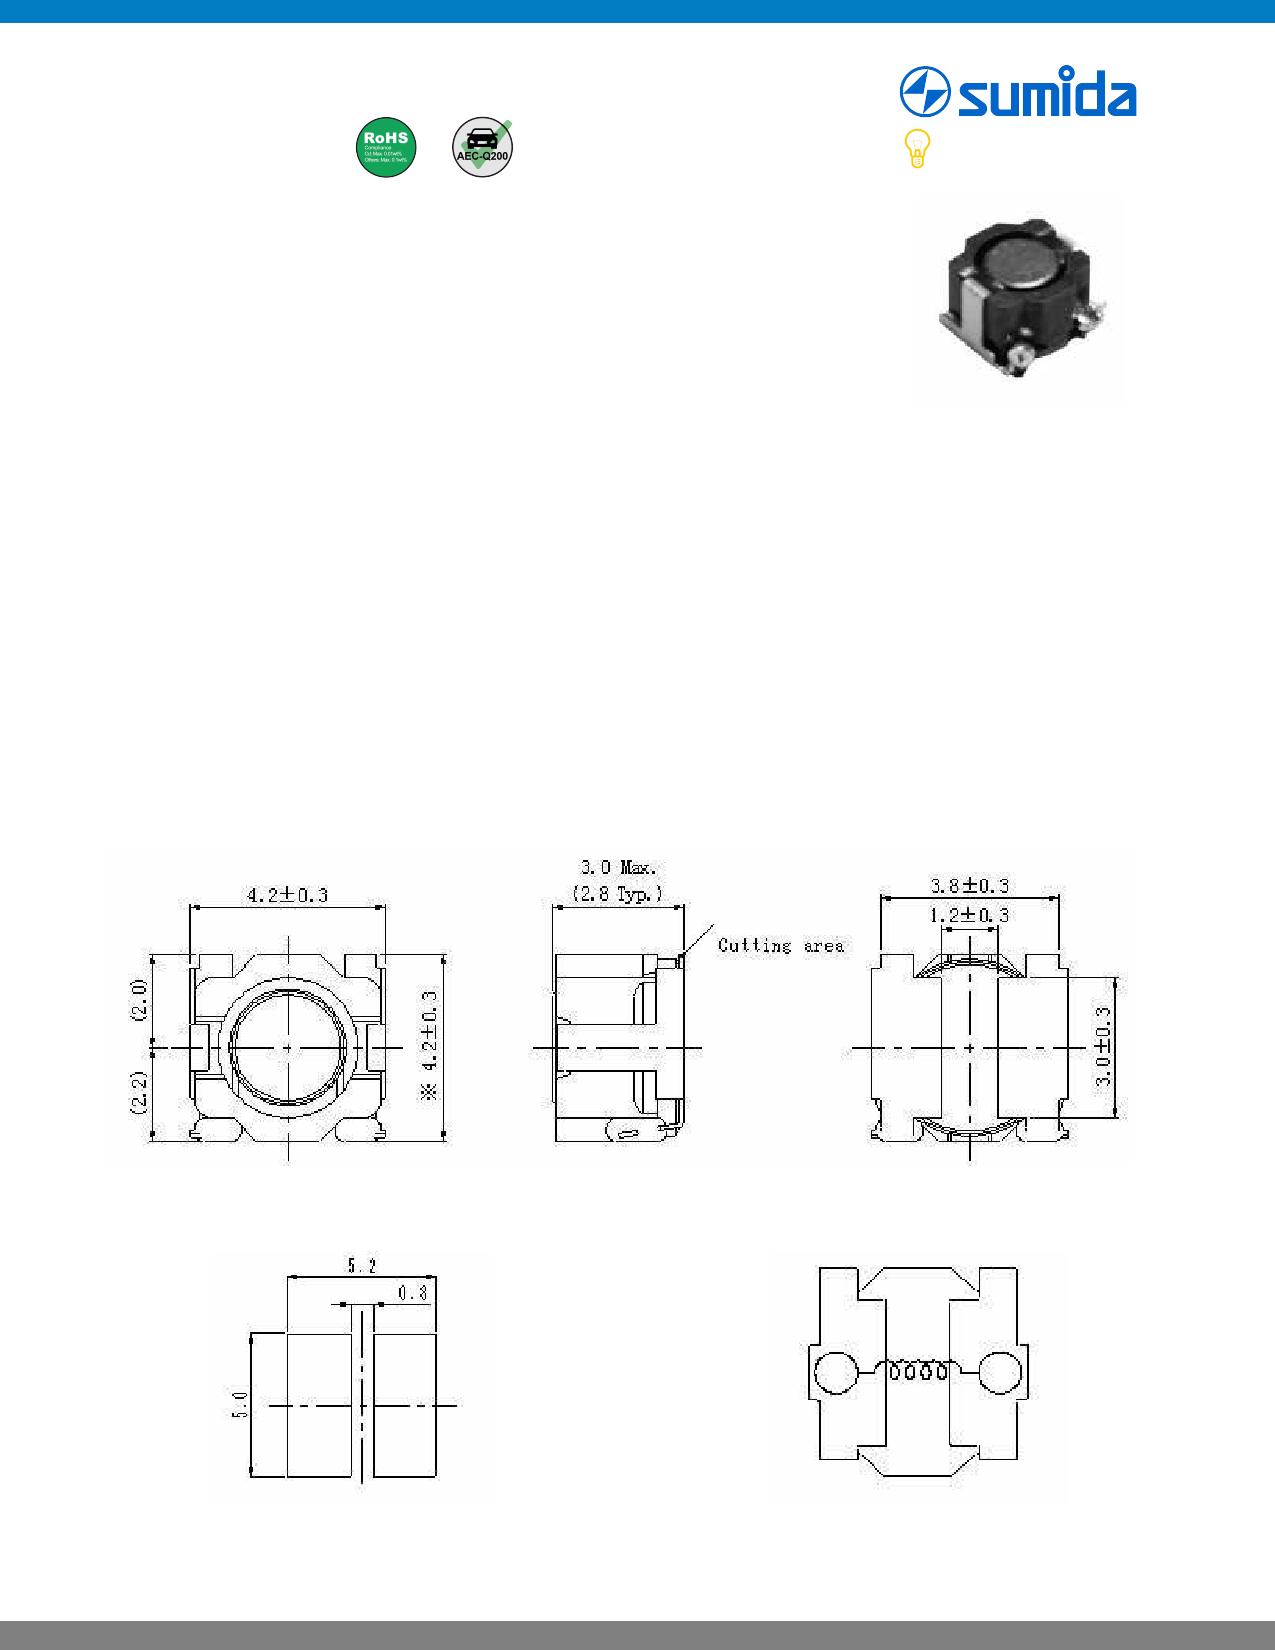 CDRH40D28T125-150NC Datasheet, CDRH40D28T125-150NC PDF,ピン配置, 機能